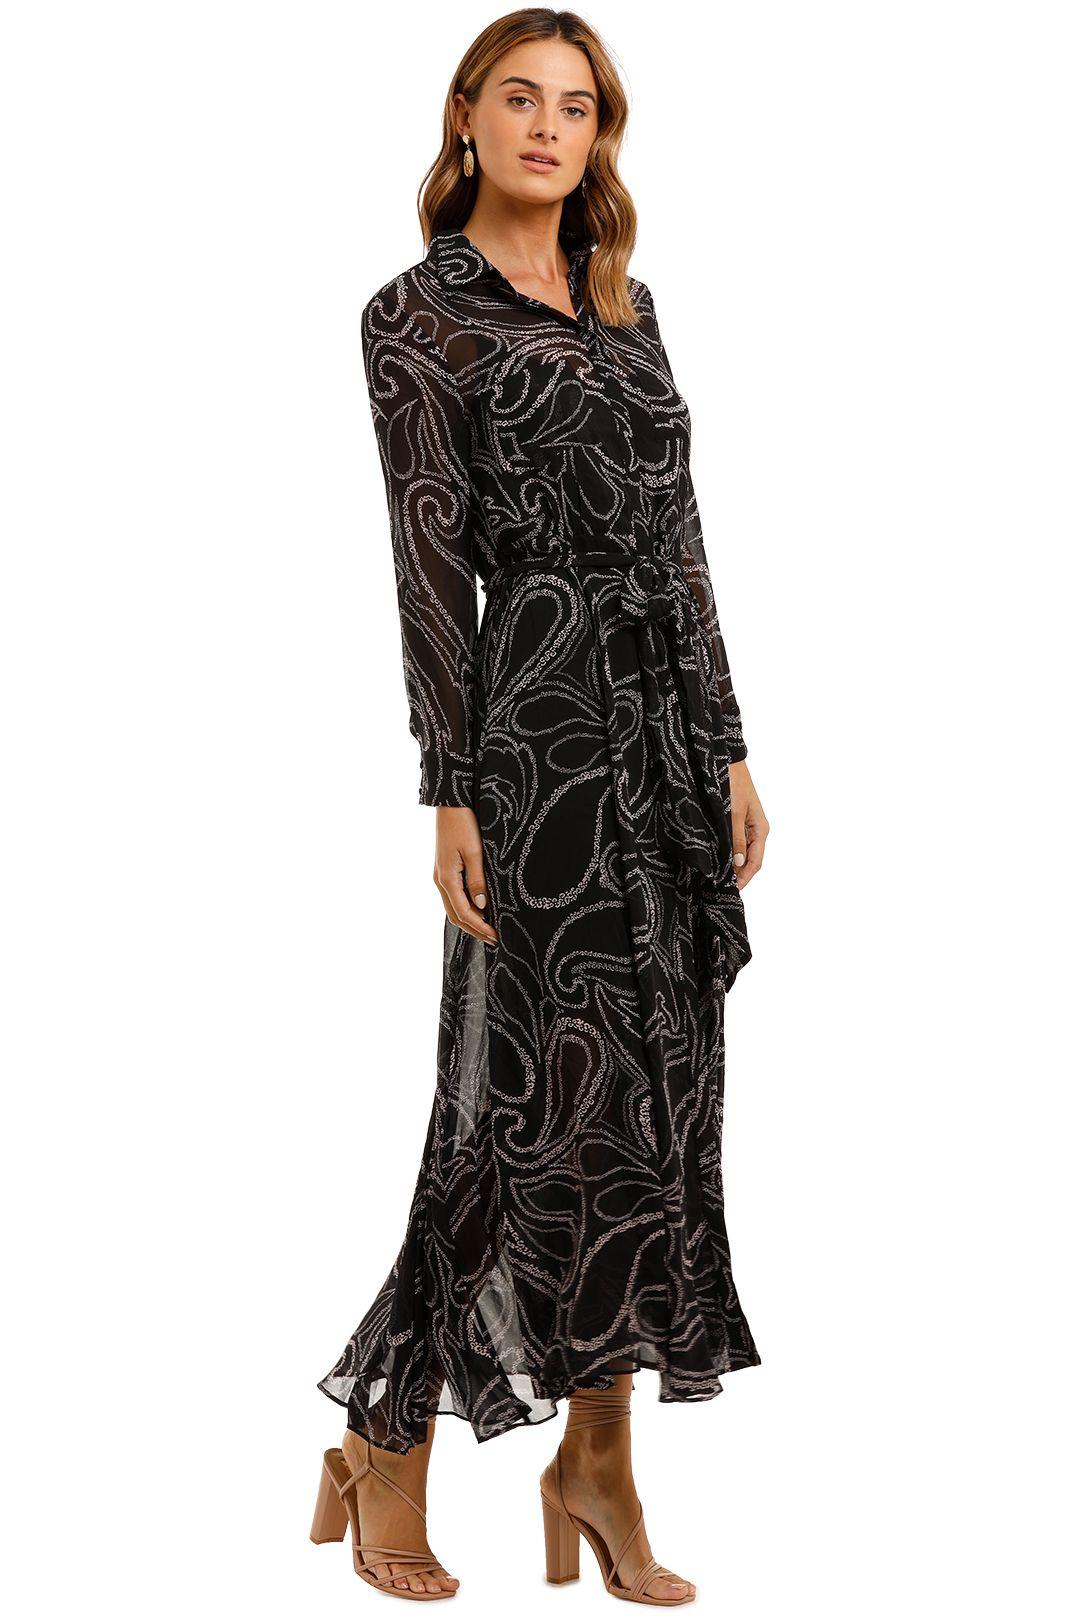 Husk Estate Dress Midi Shirt Dress